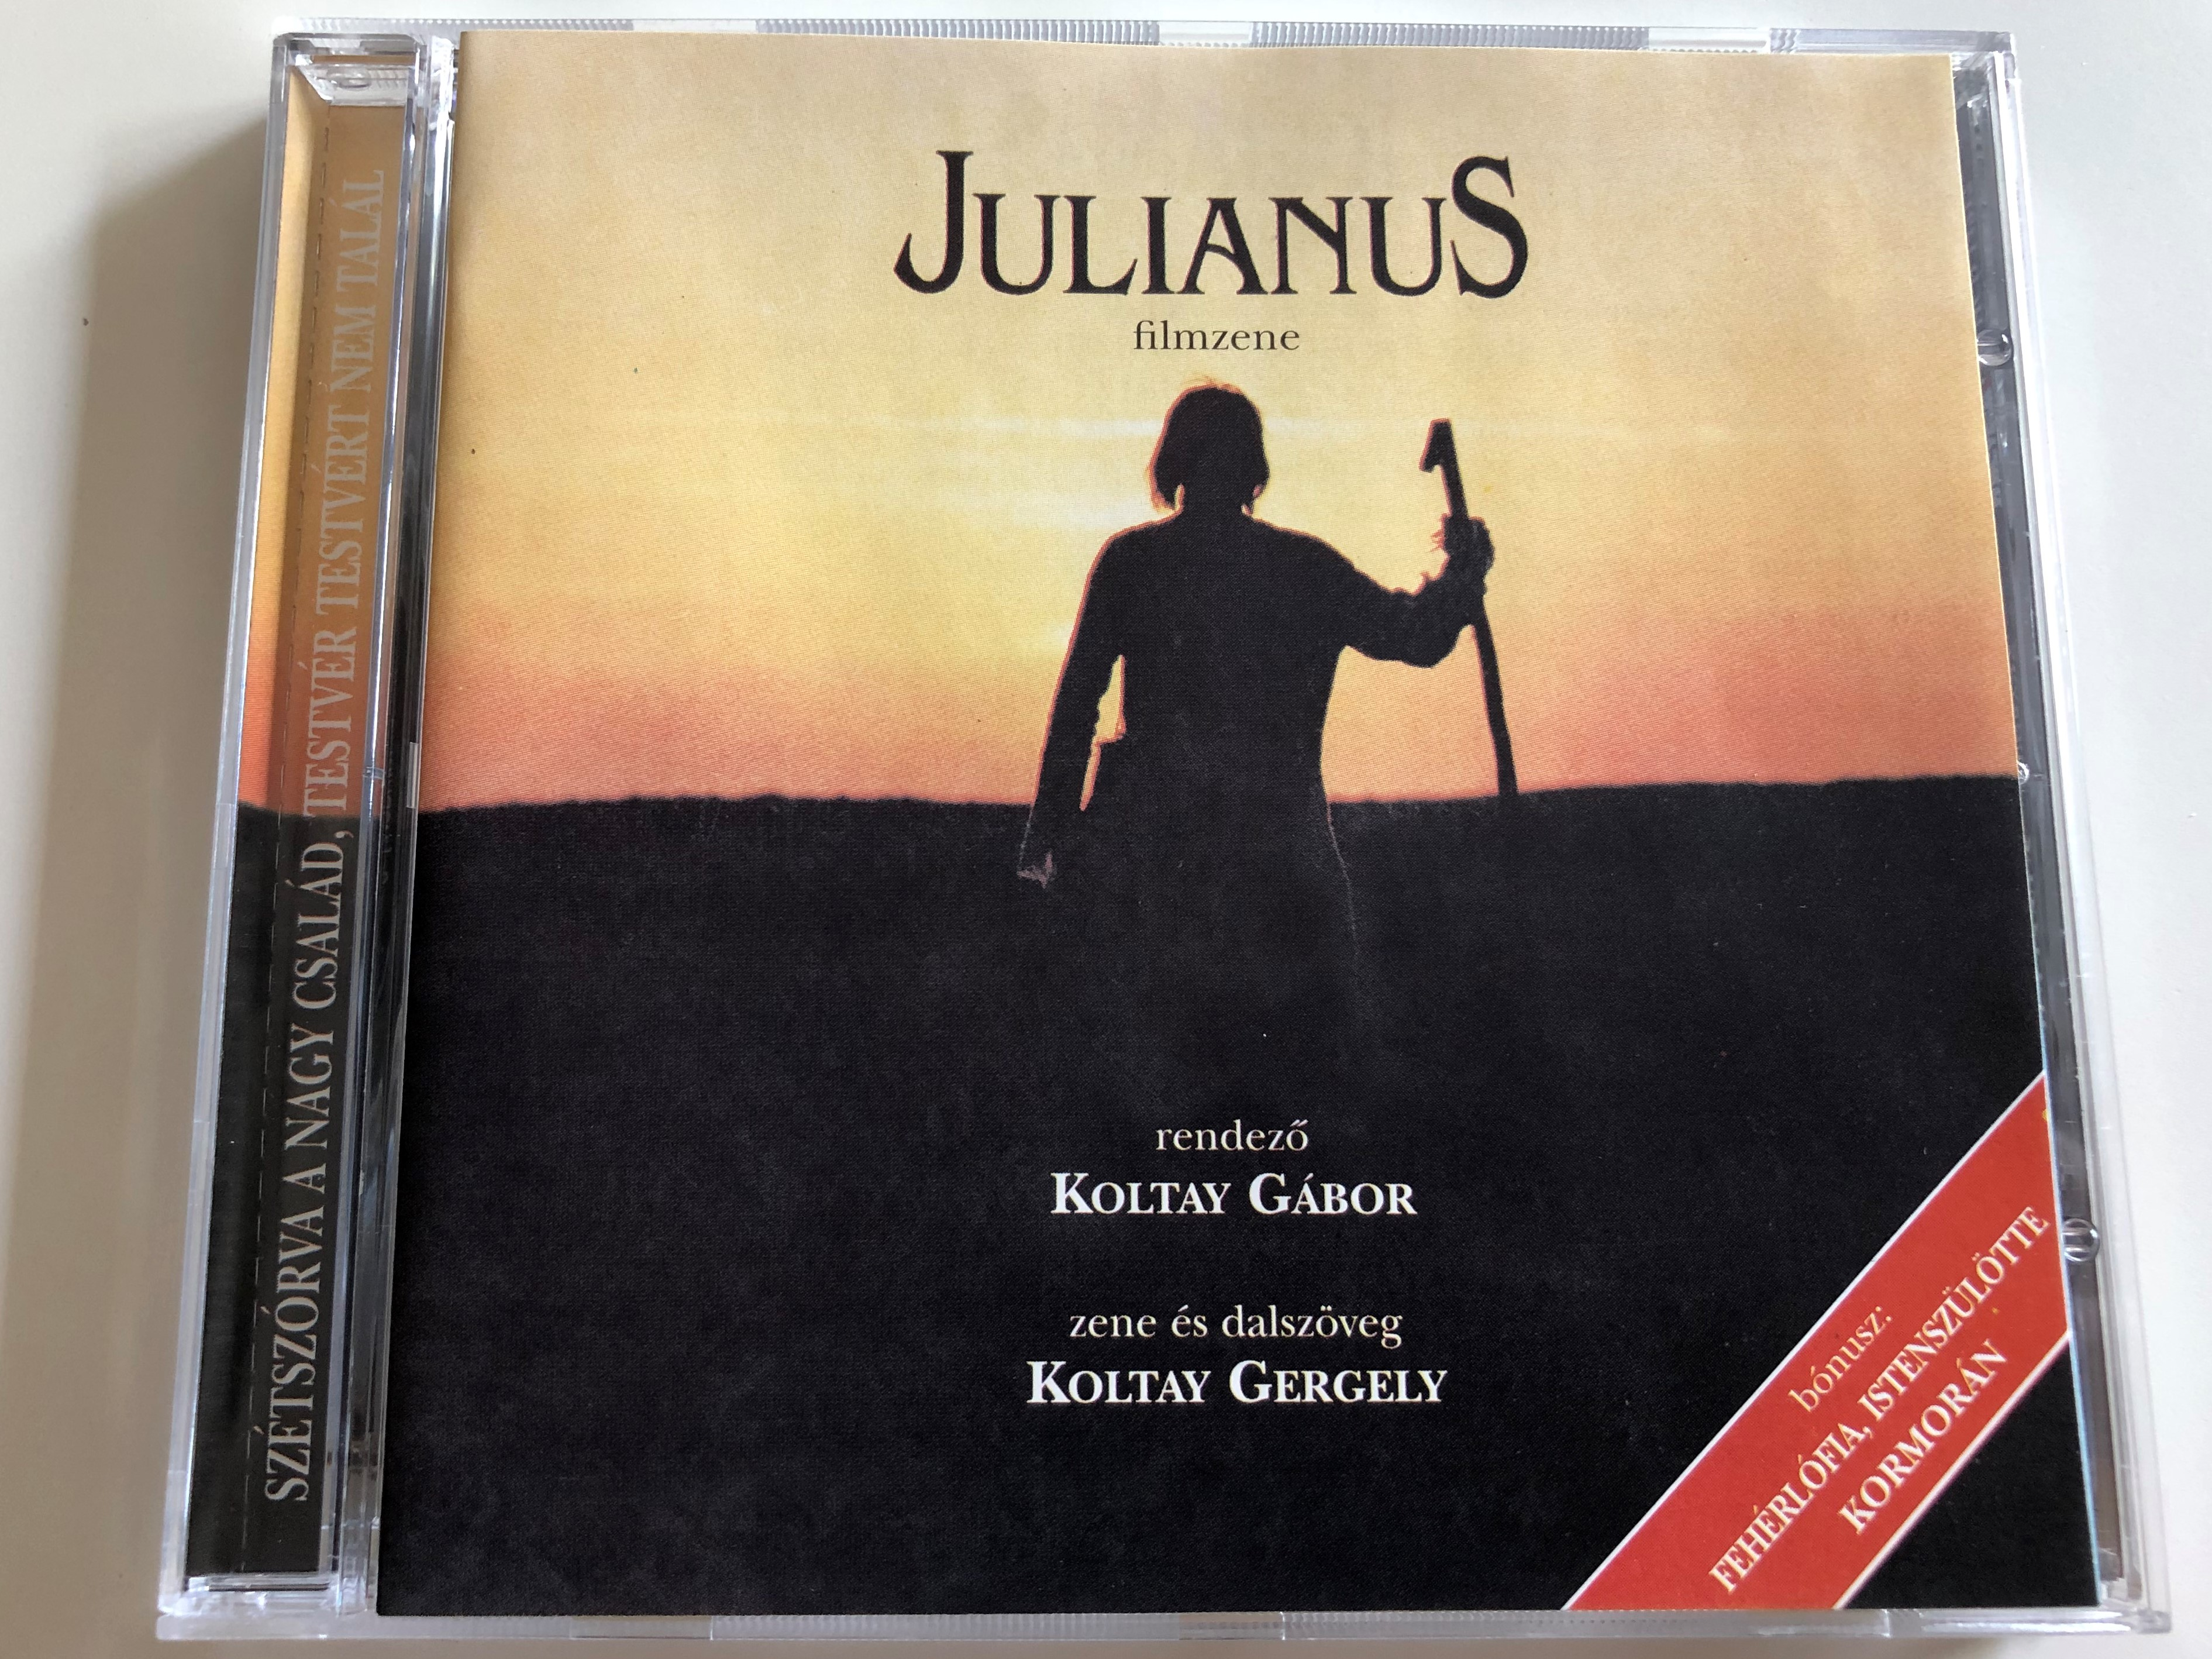 julianus-filmzene-ost-directed-by-koltay-g-bor-music-and-text-by-koltay-gergely-sz-tsz-rva-a-nagy-csal-d-testv-r-testv-rt-nem-tal-l-bonus-feh-rl-fia-istensz-l-tte-kormor-n-hungaroton-1-.jpg